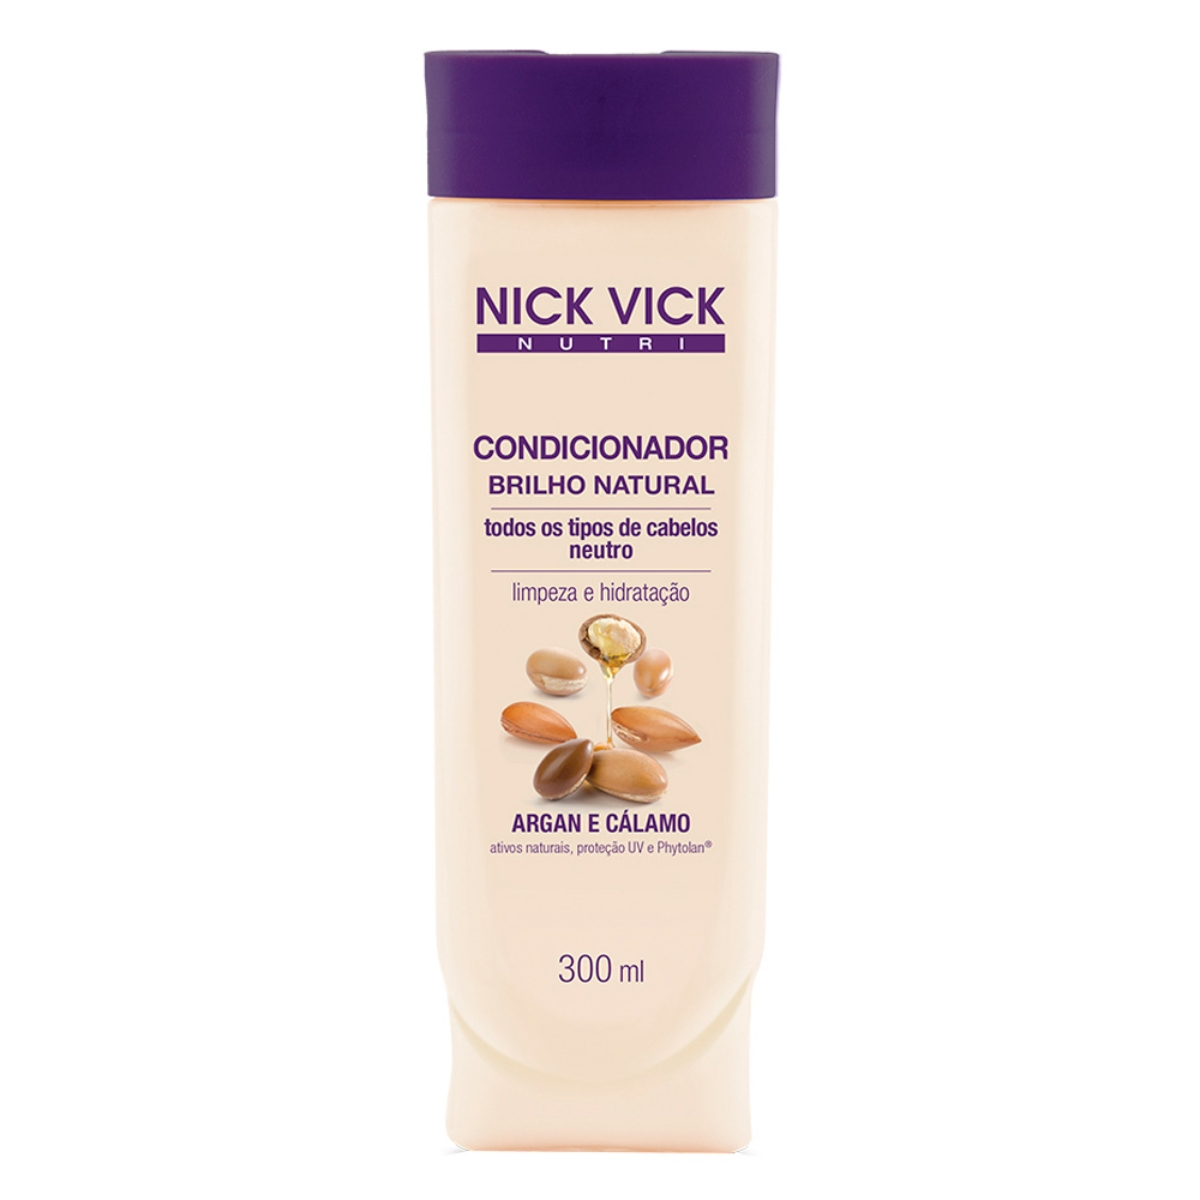 Condicionador Nick e Vick Nutri Brilho Natural 300ml